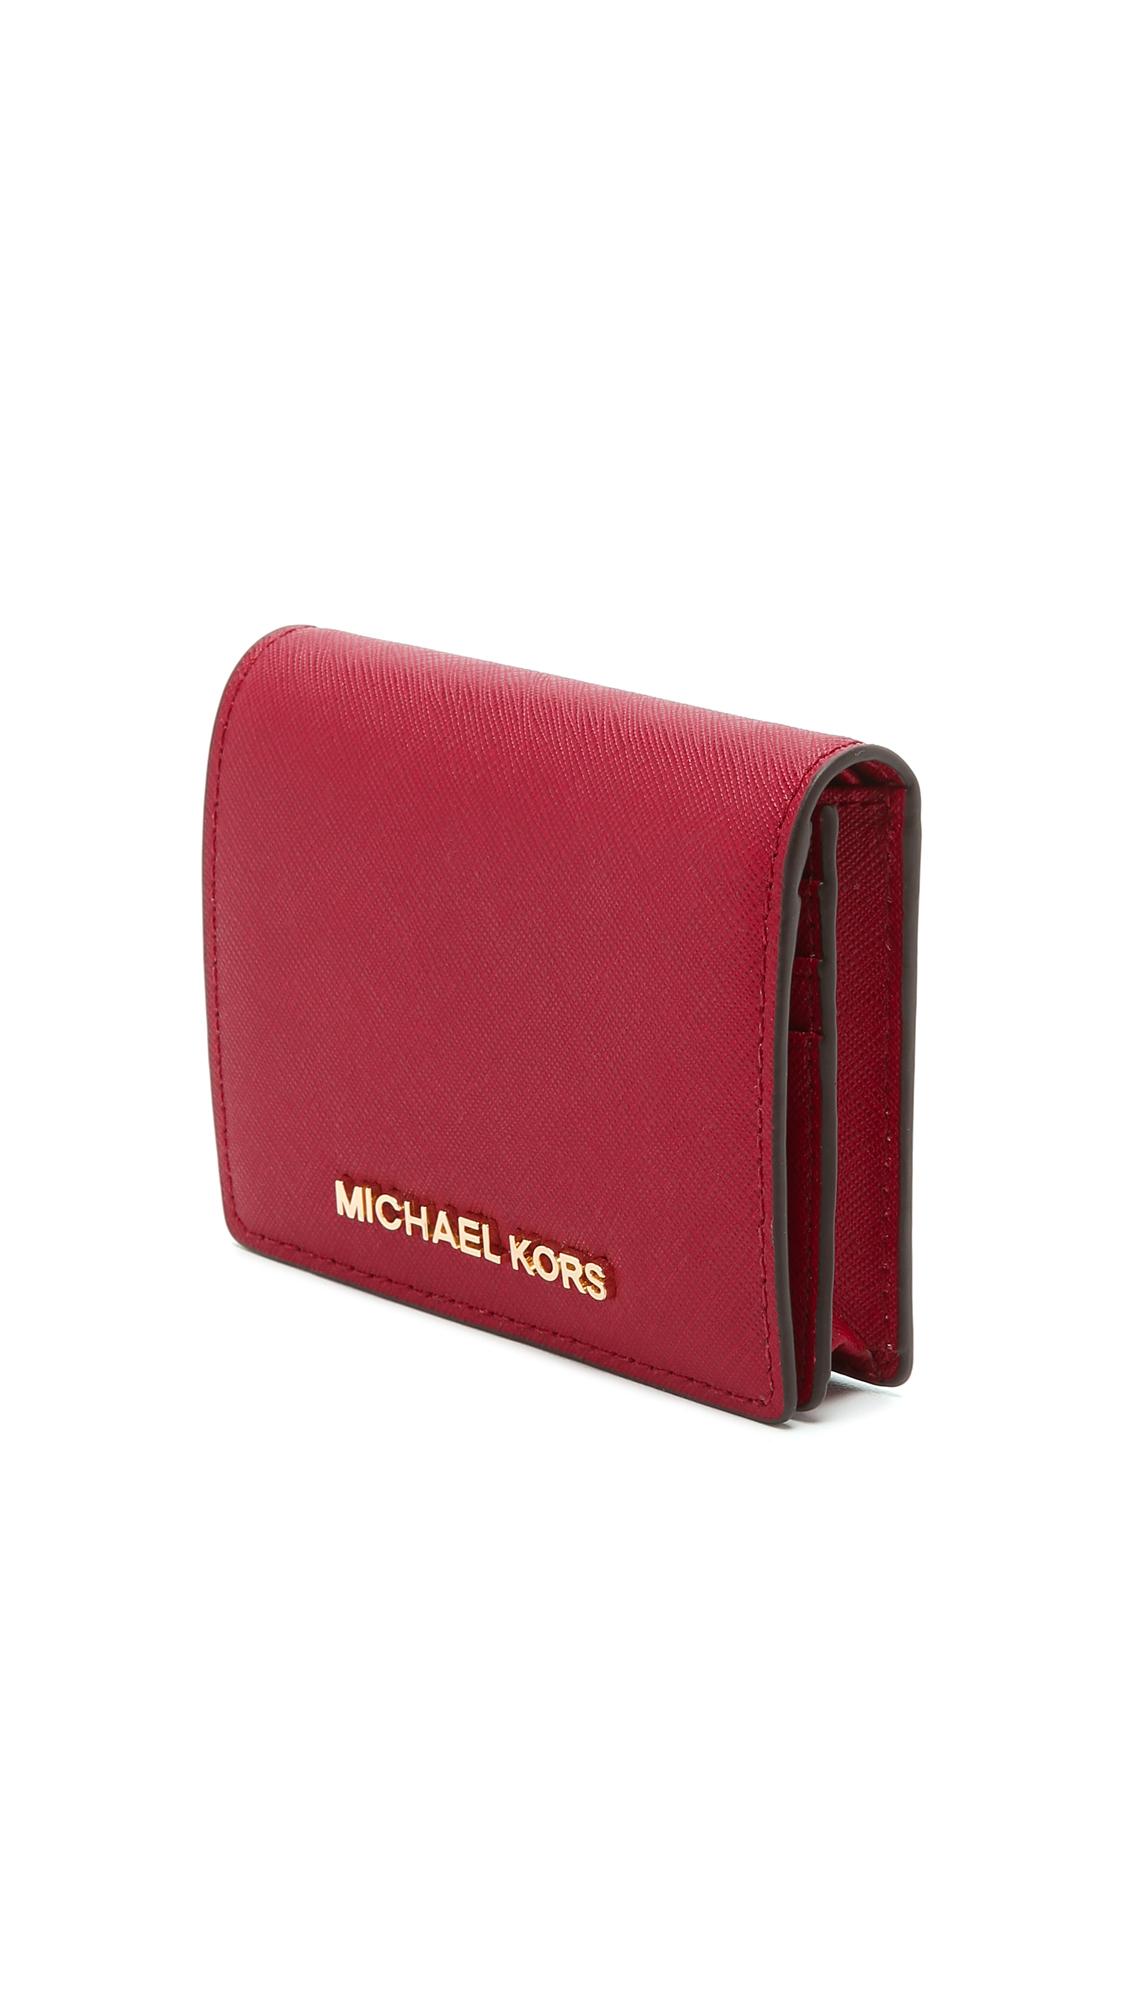 8793c26f8ca0 Red Michael Kors Wallet - Best Photo Wallet Justiceforkenny.Org